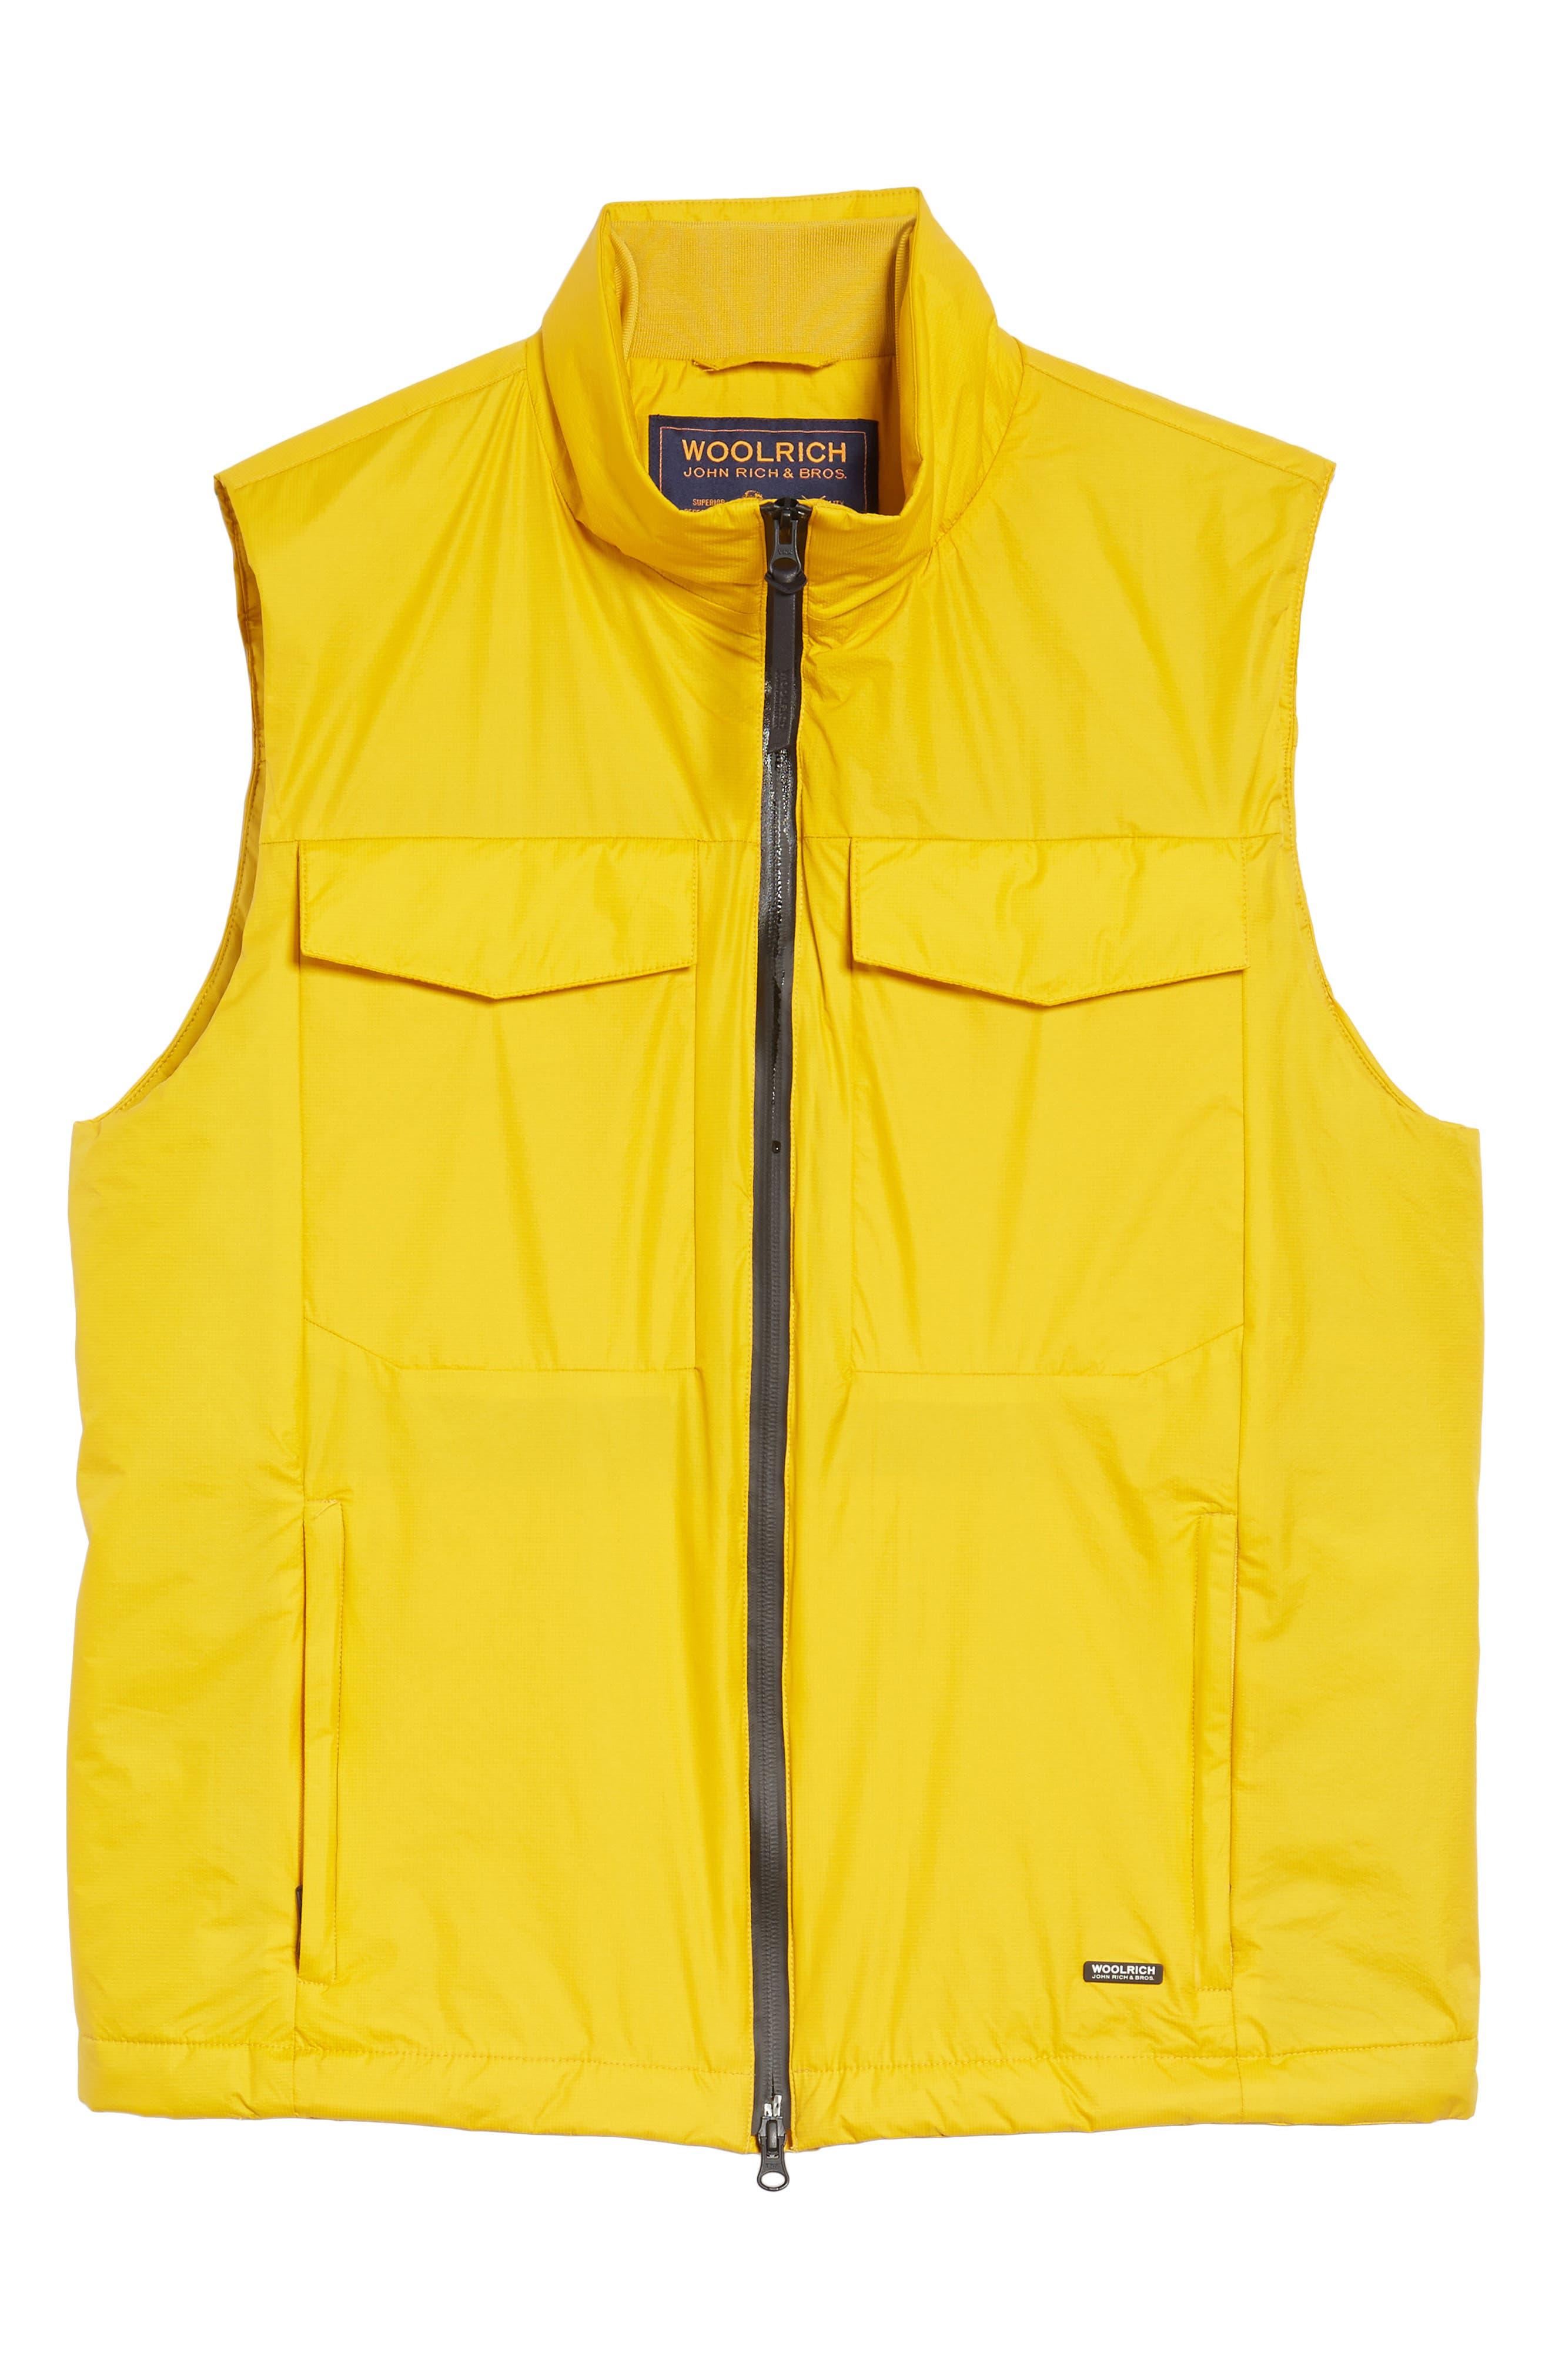 & Bros. Bering Vest,                             Alternate thumbnail 6, color,                             Golden Spice